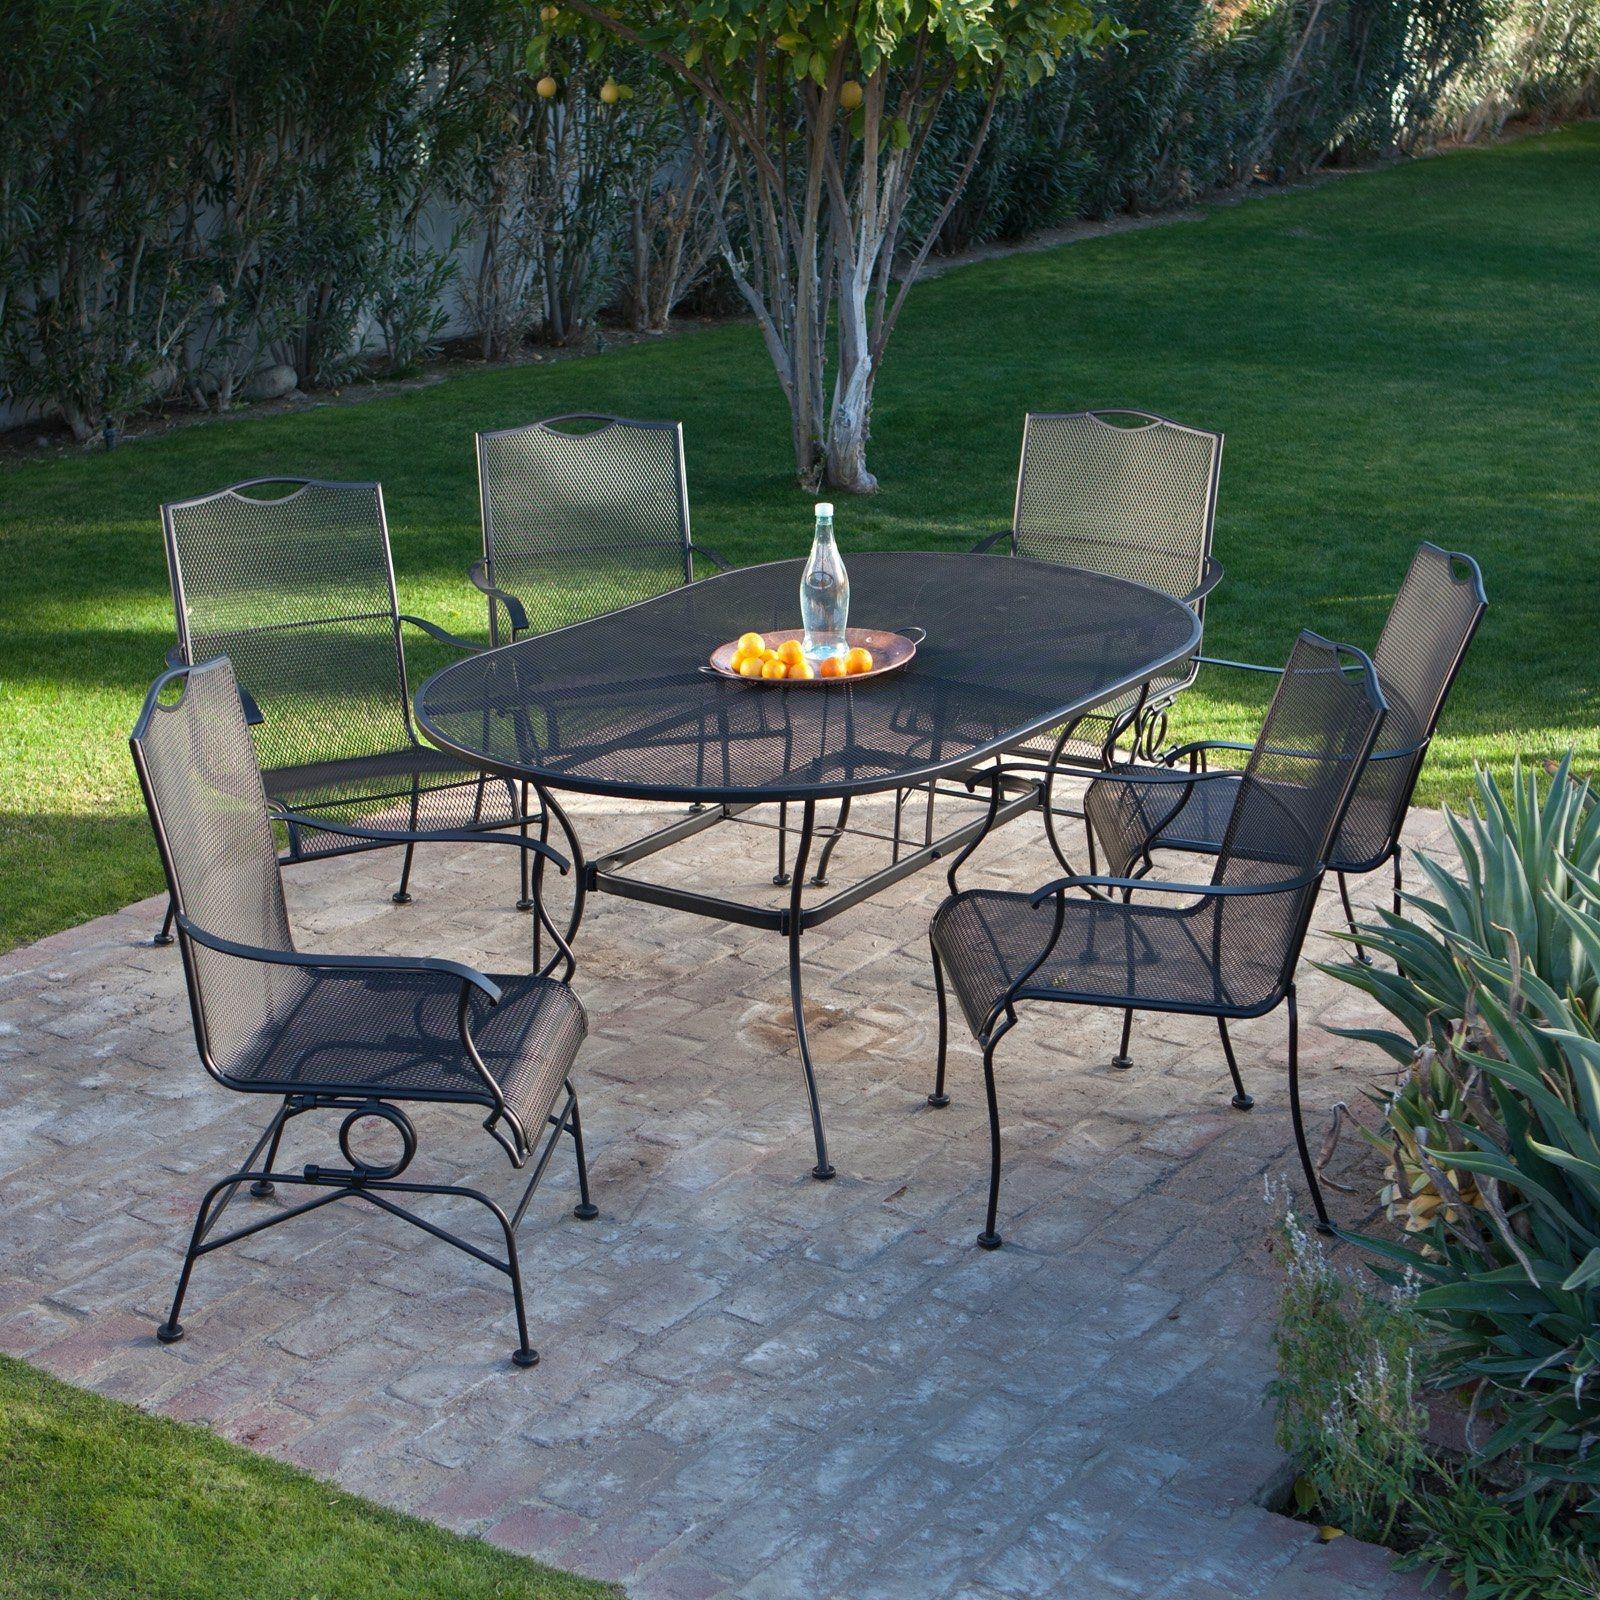 Black Wrought Iron Patio Furniture Sets Patio Decor